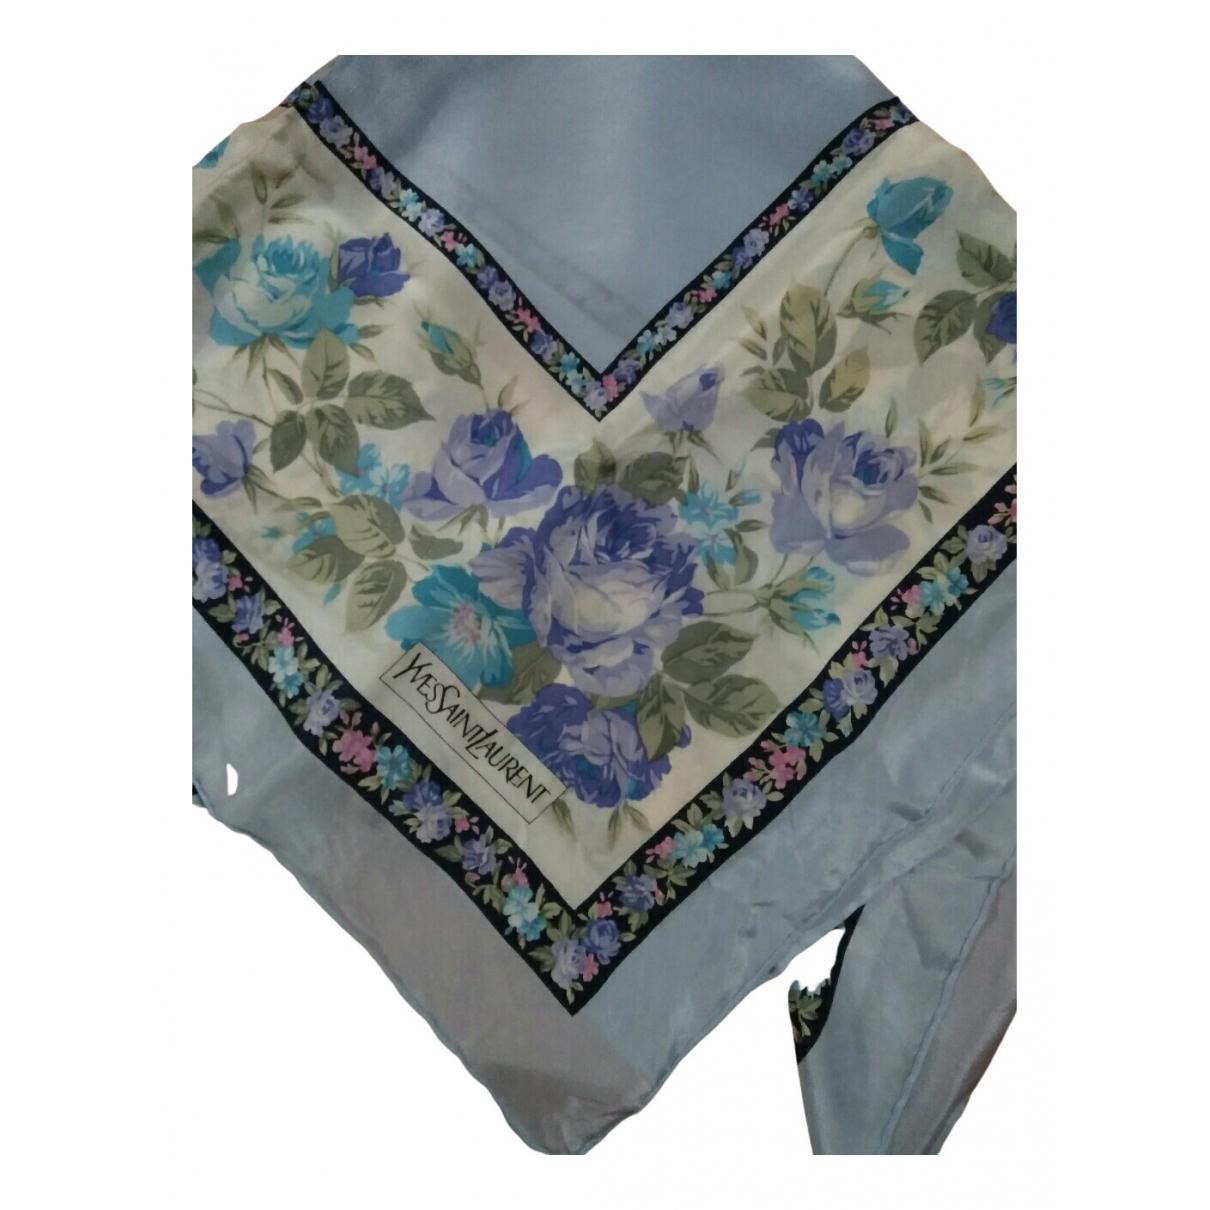 Yves Saint Laurent N Silk scarf for Women N